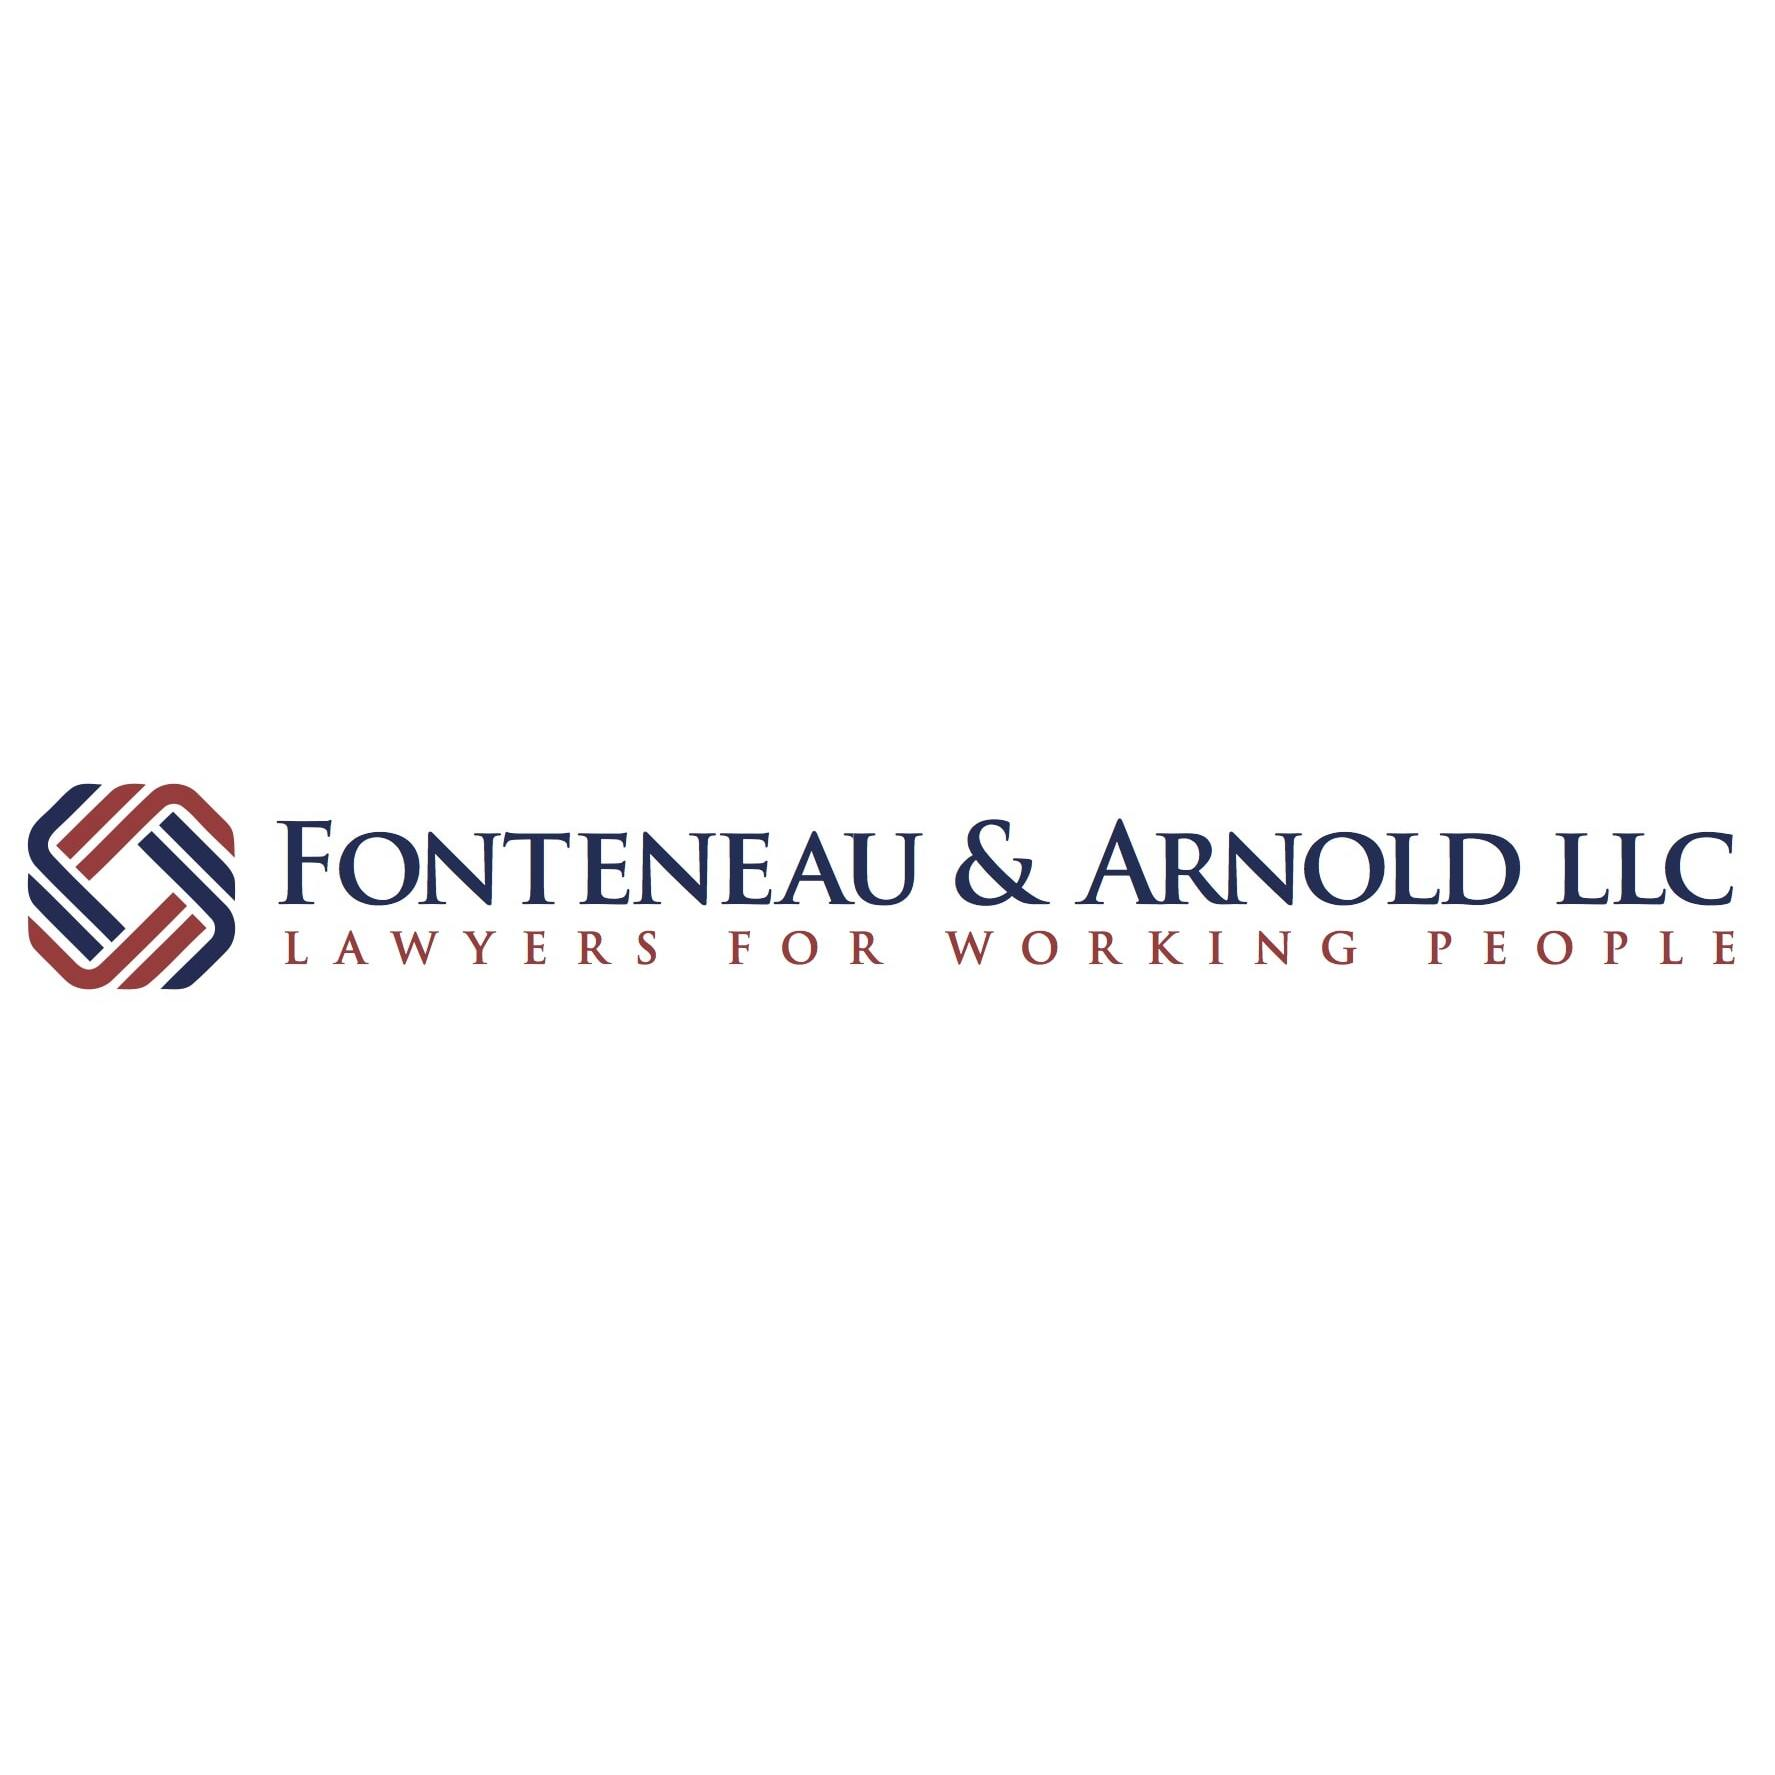 Fonteneau & Arnold LLC